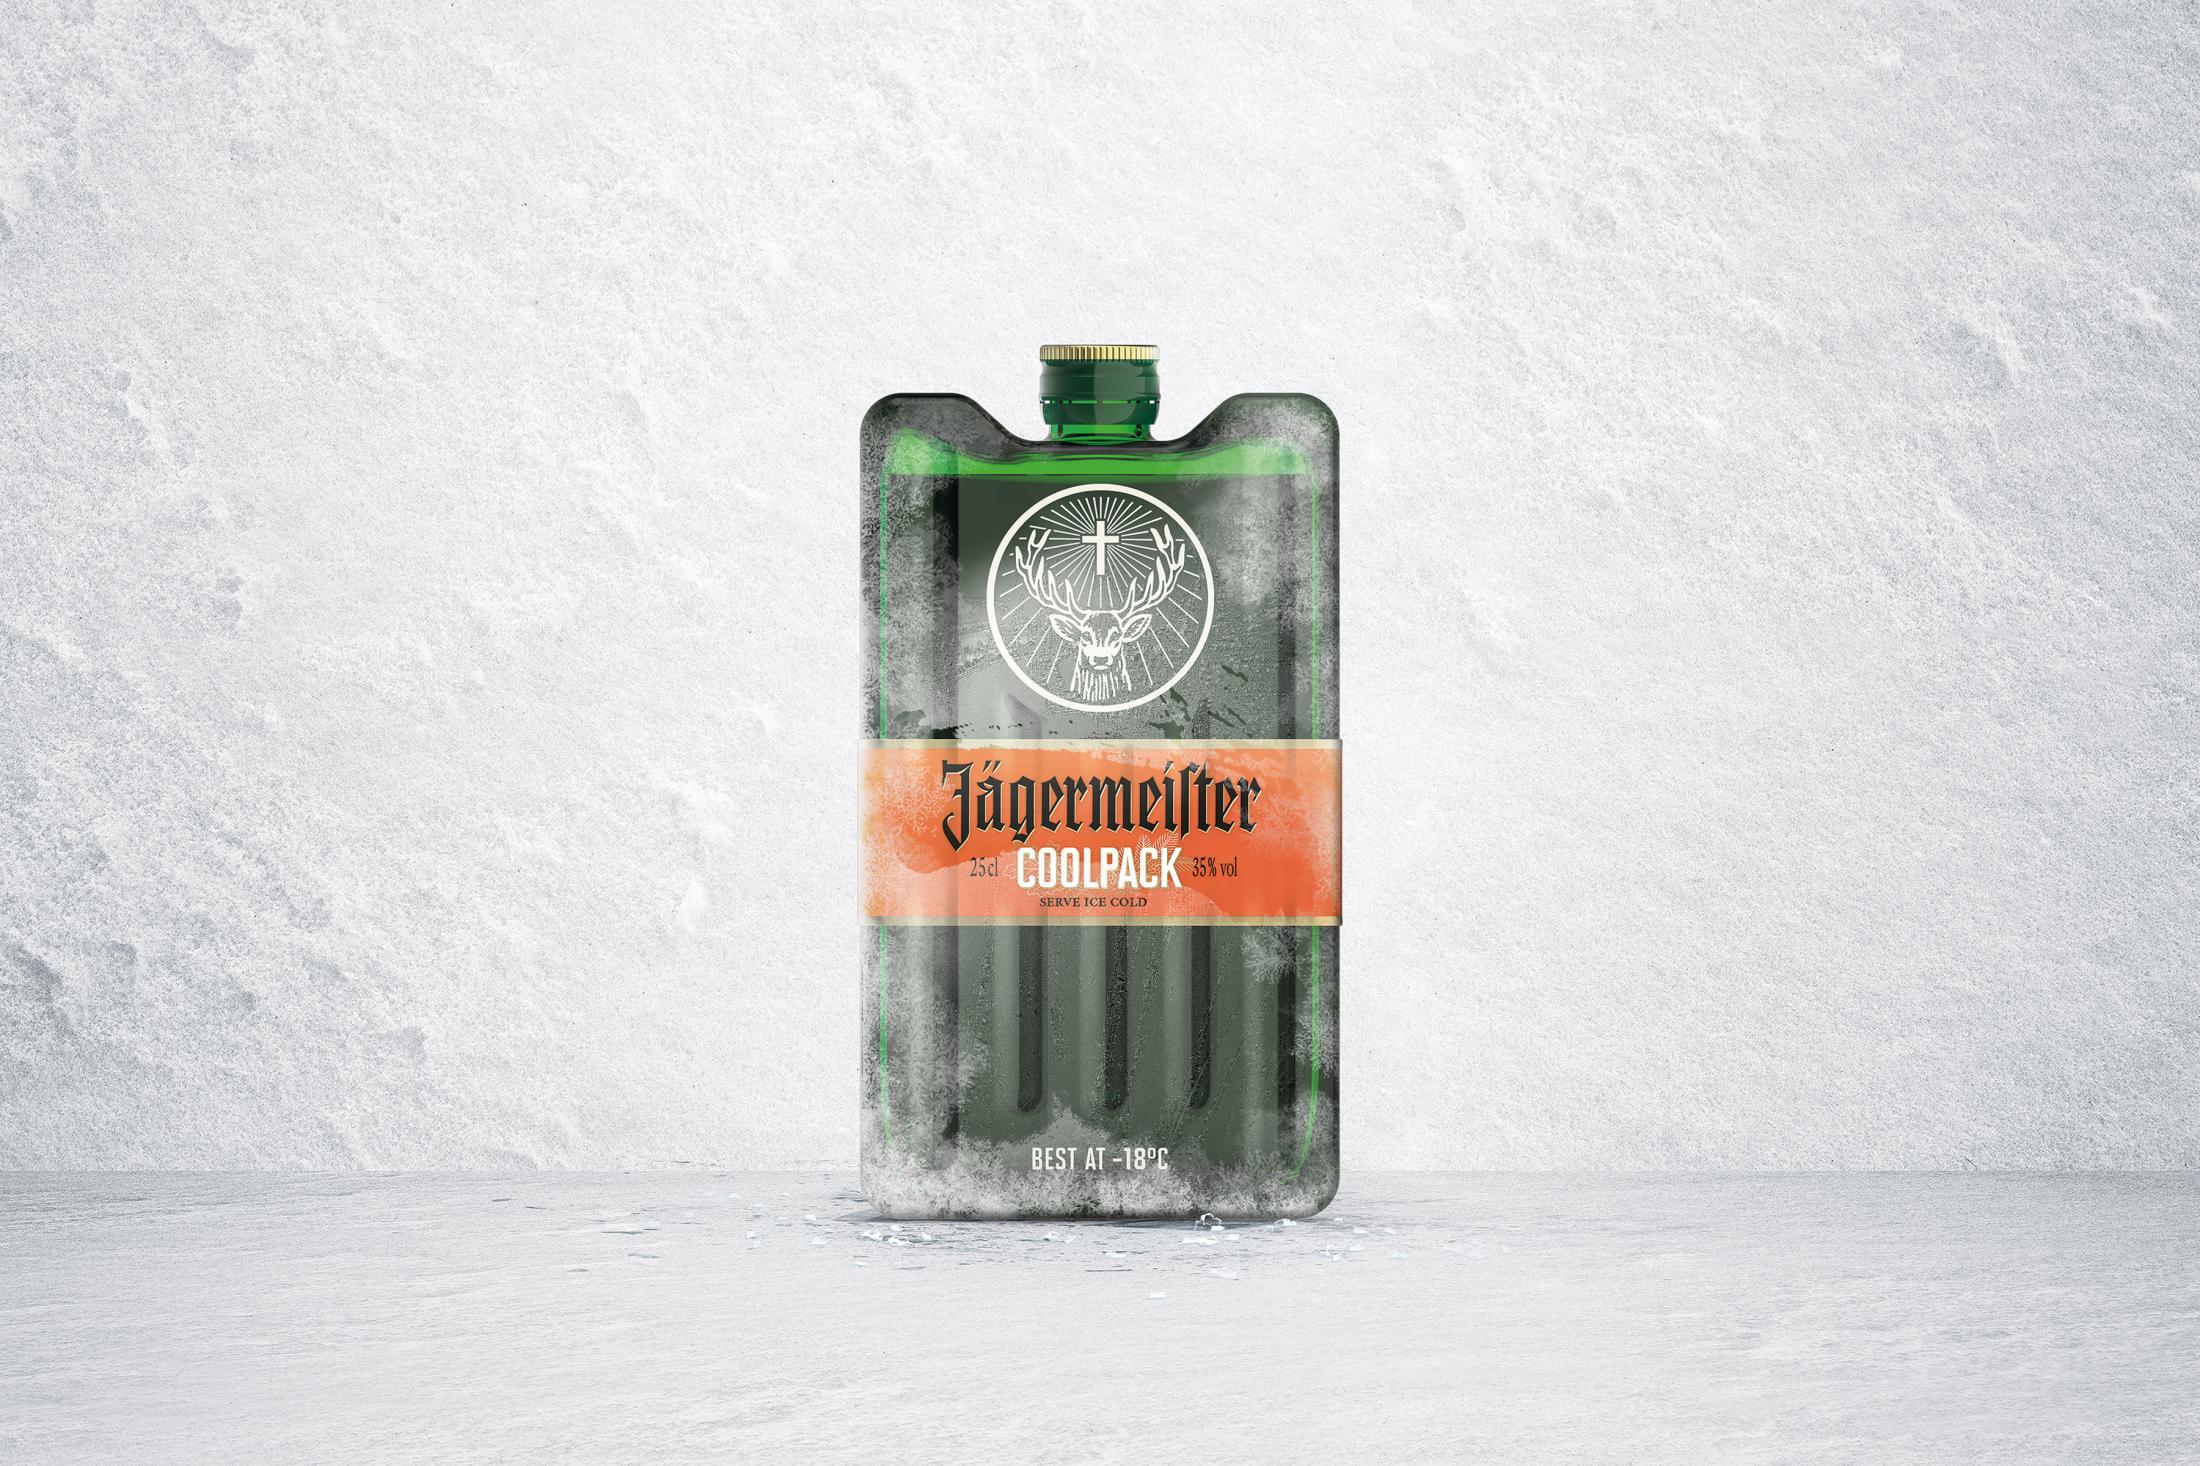 Thumbnail for Jägermeister Coolpack